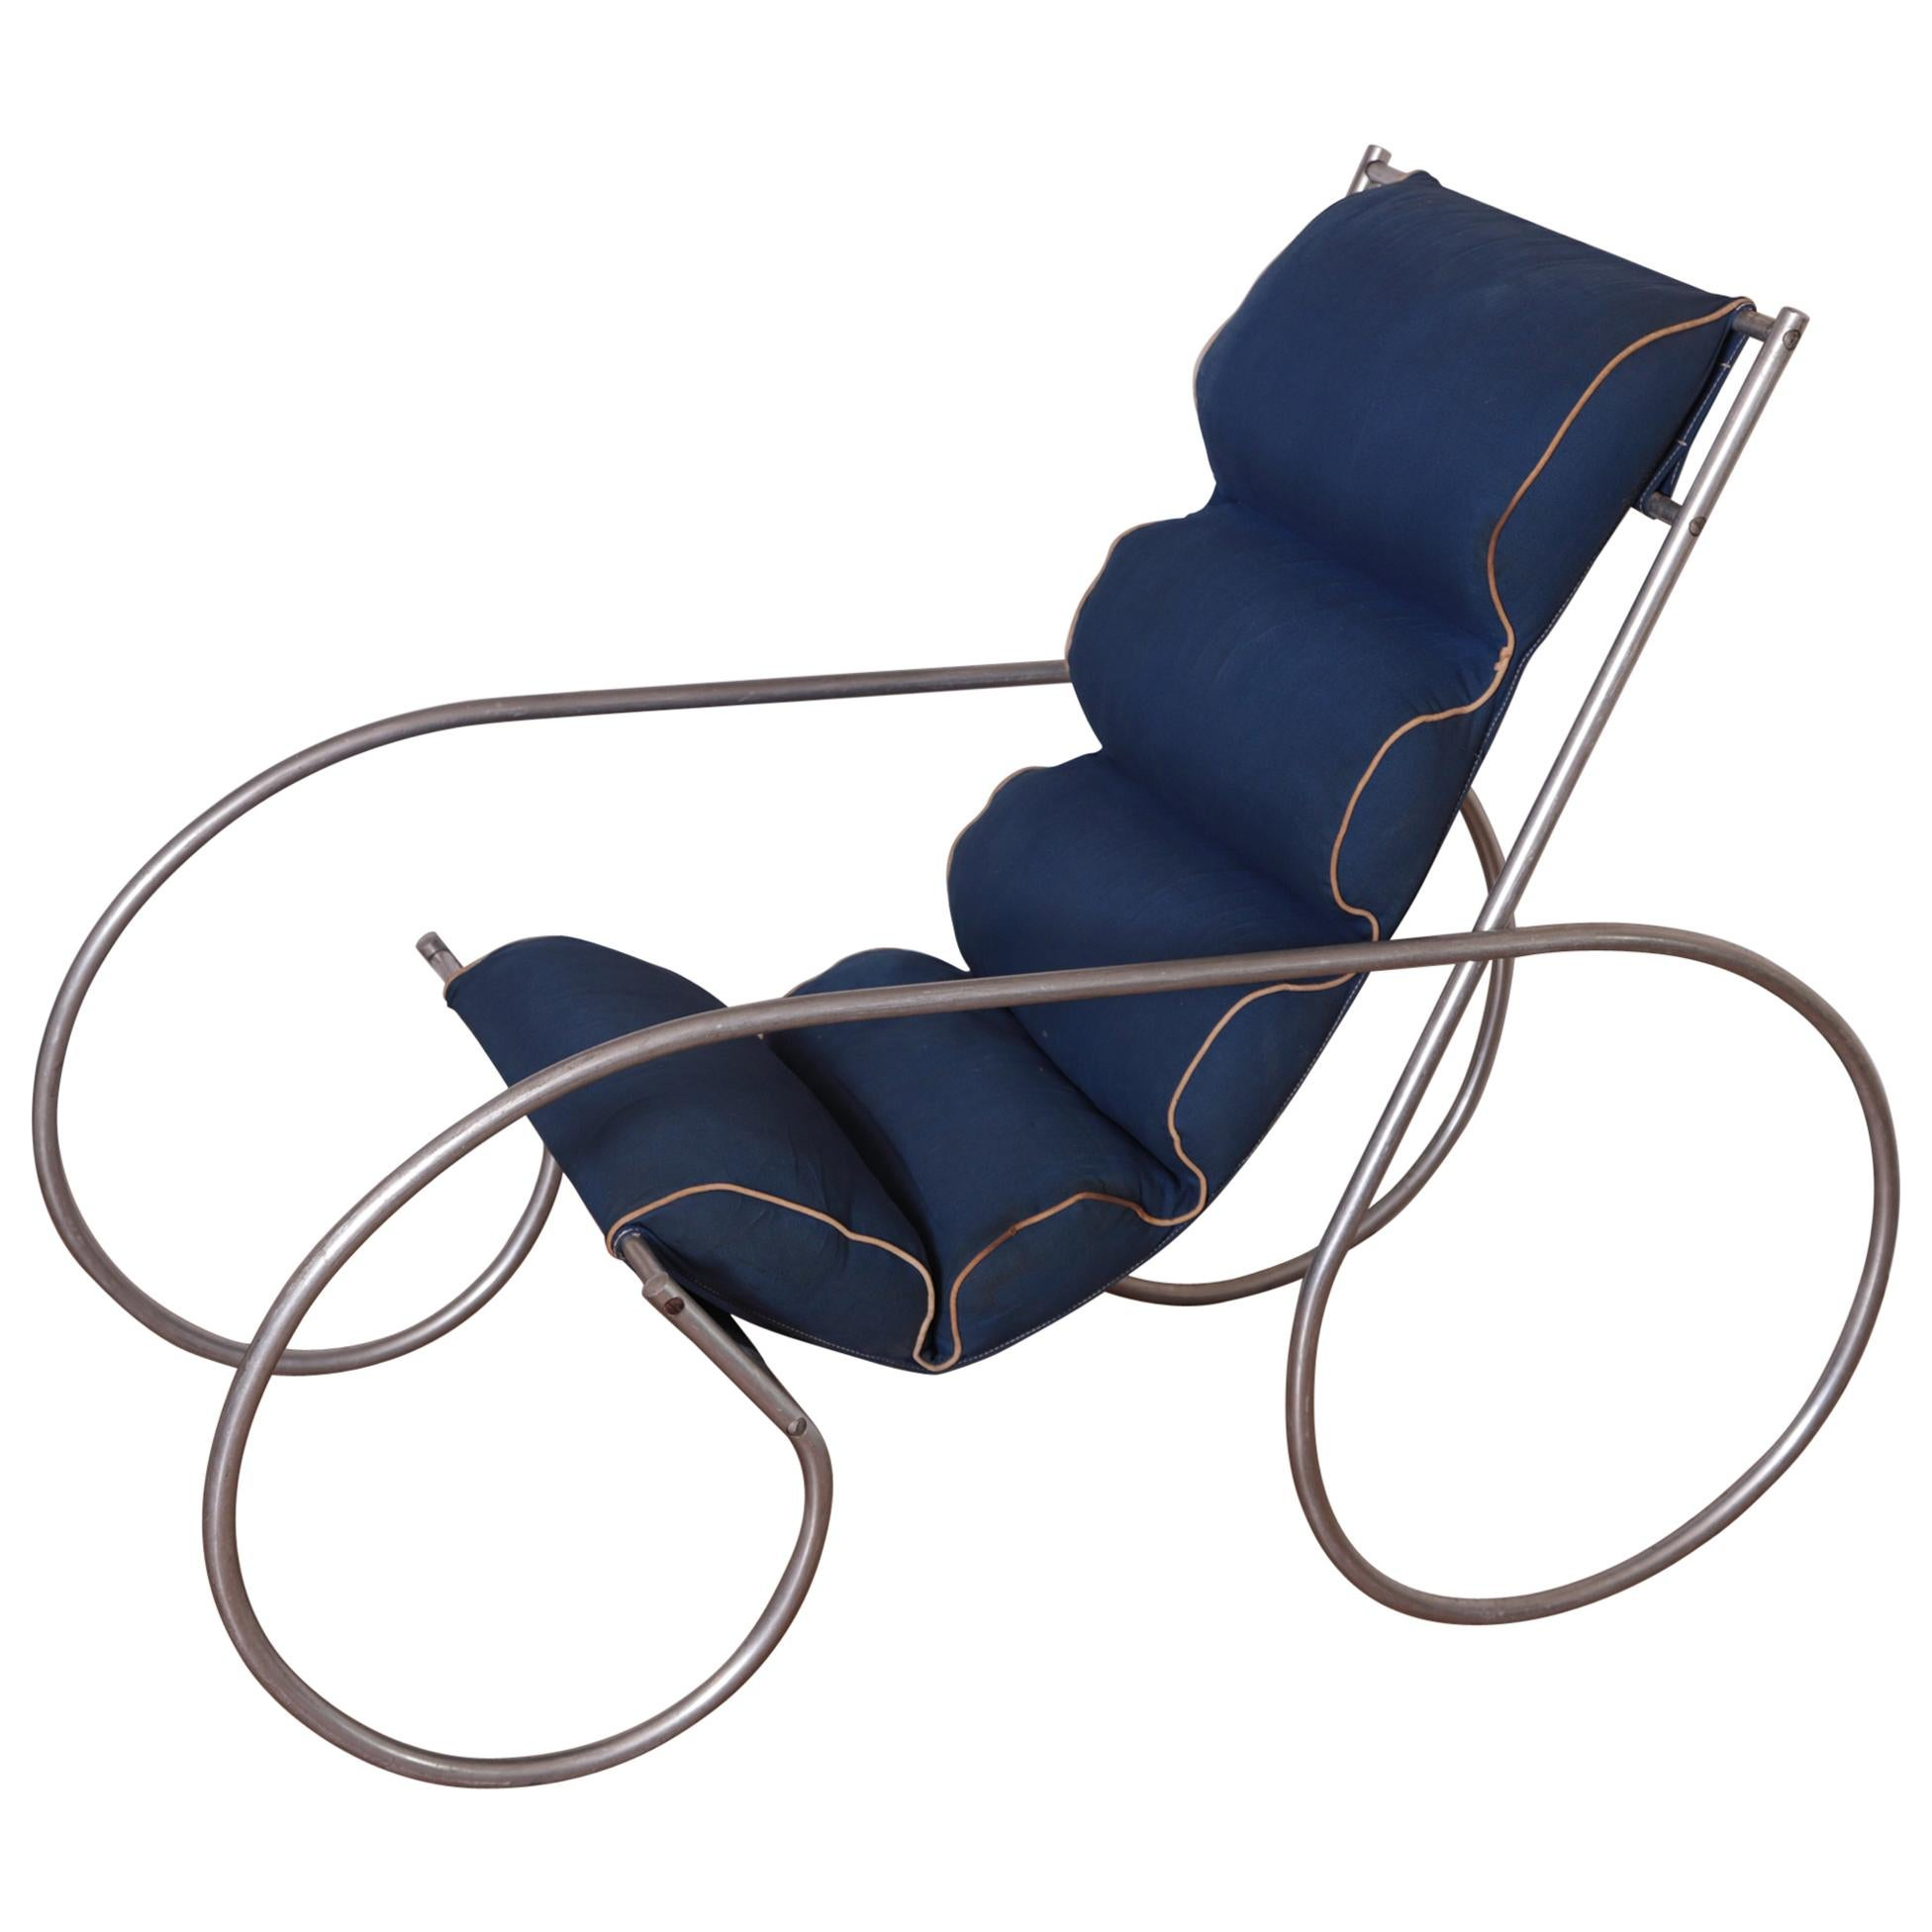 Art Deco Machine Age Streamline Indoor / Outdoor Tubular Aluminum Lounge Chair